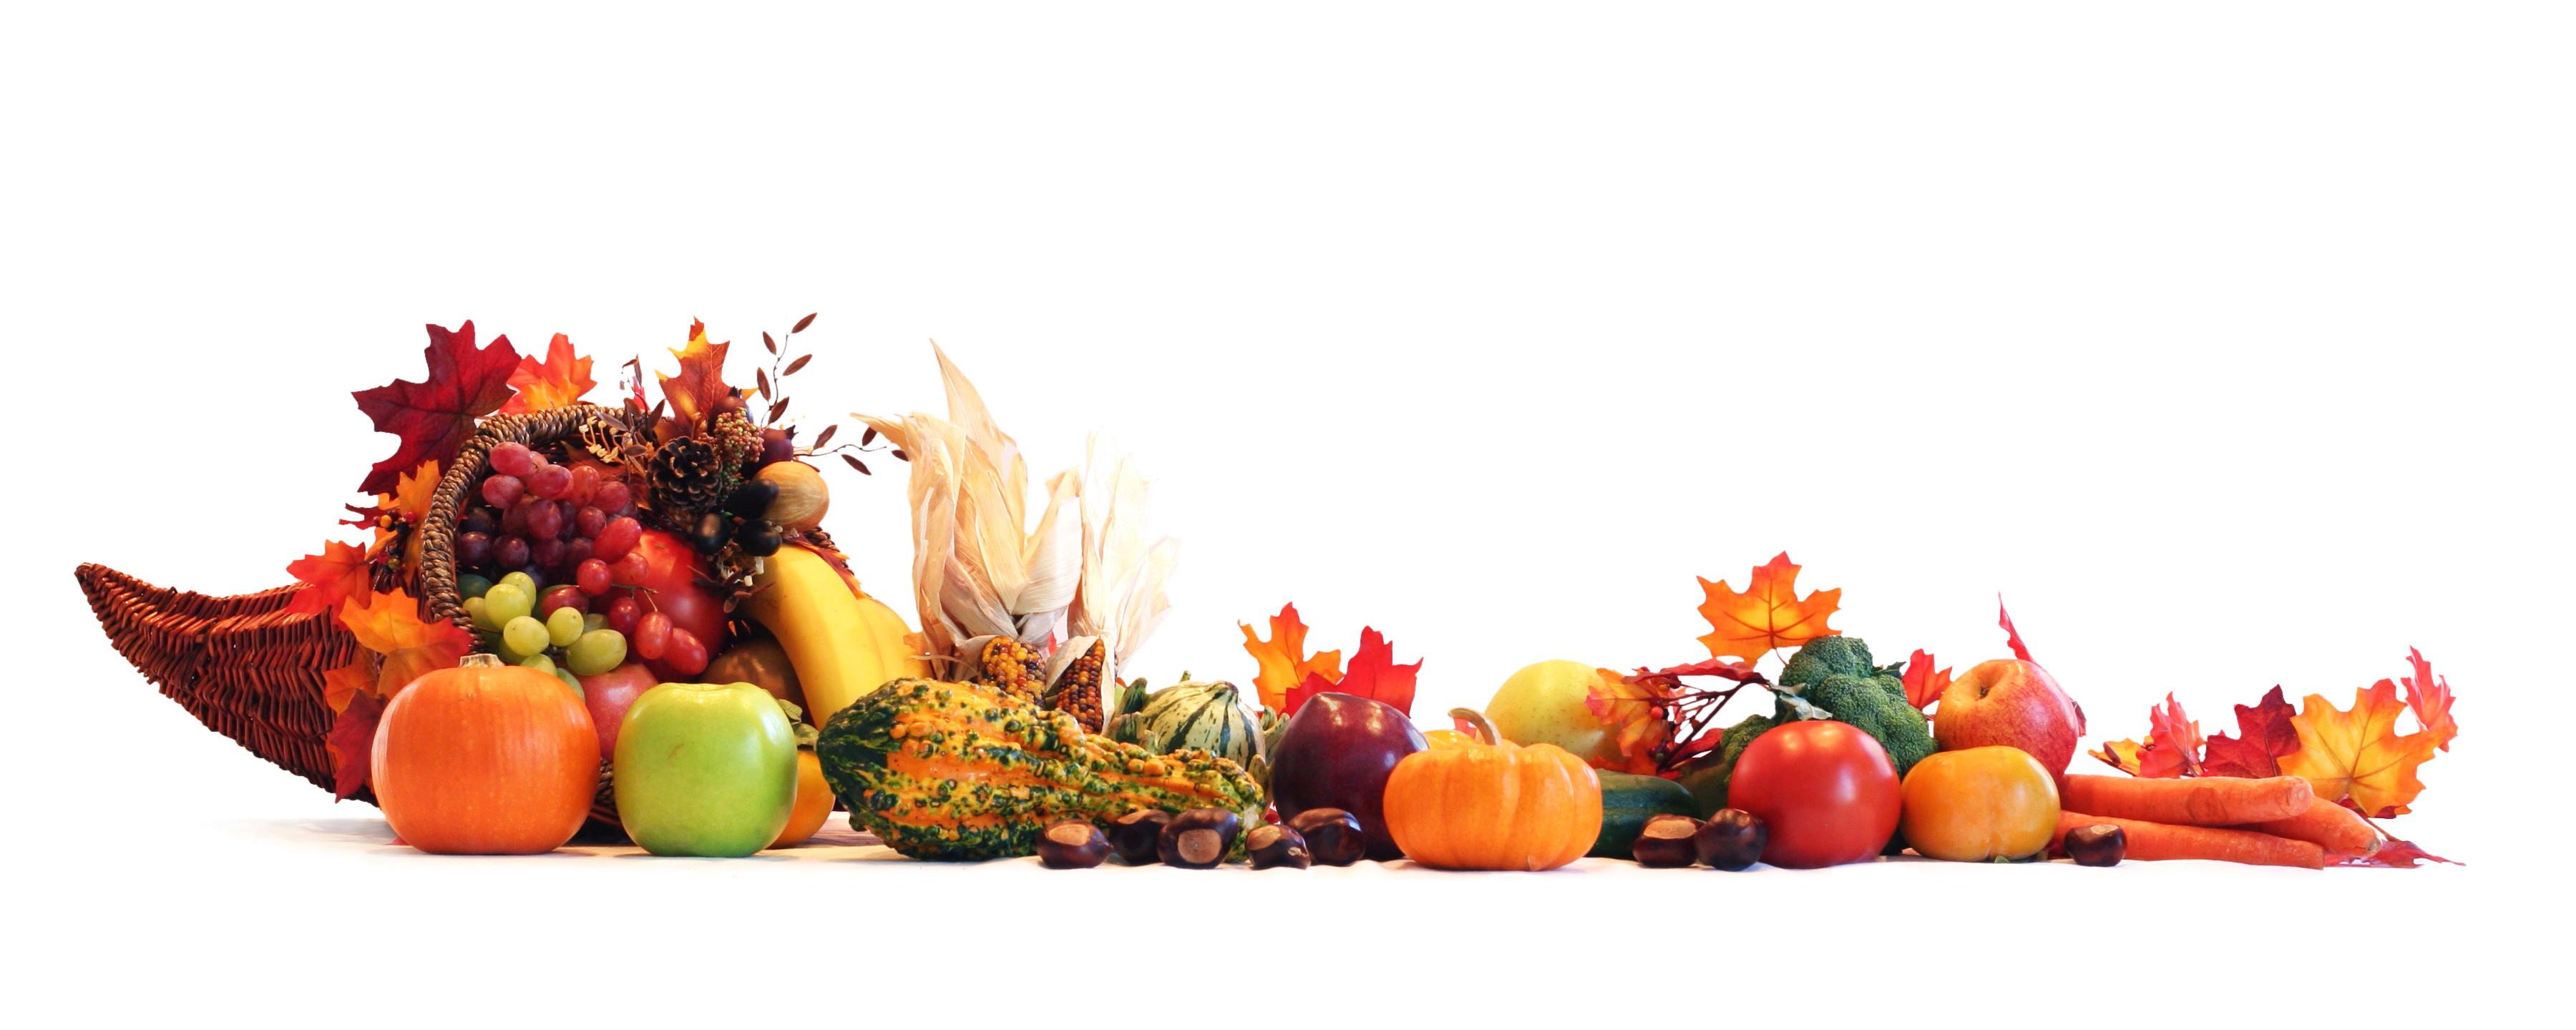 Lightened-Up Thanksgiving: Crockpot Edition